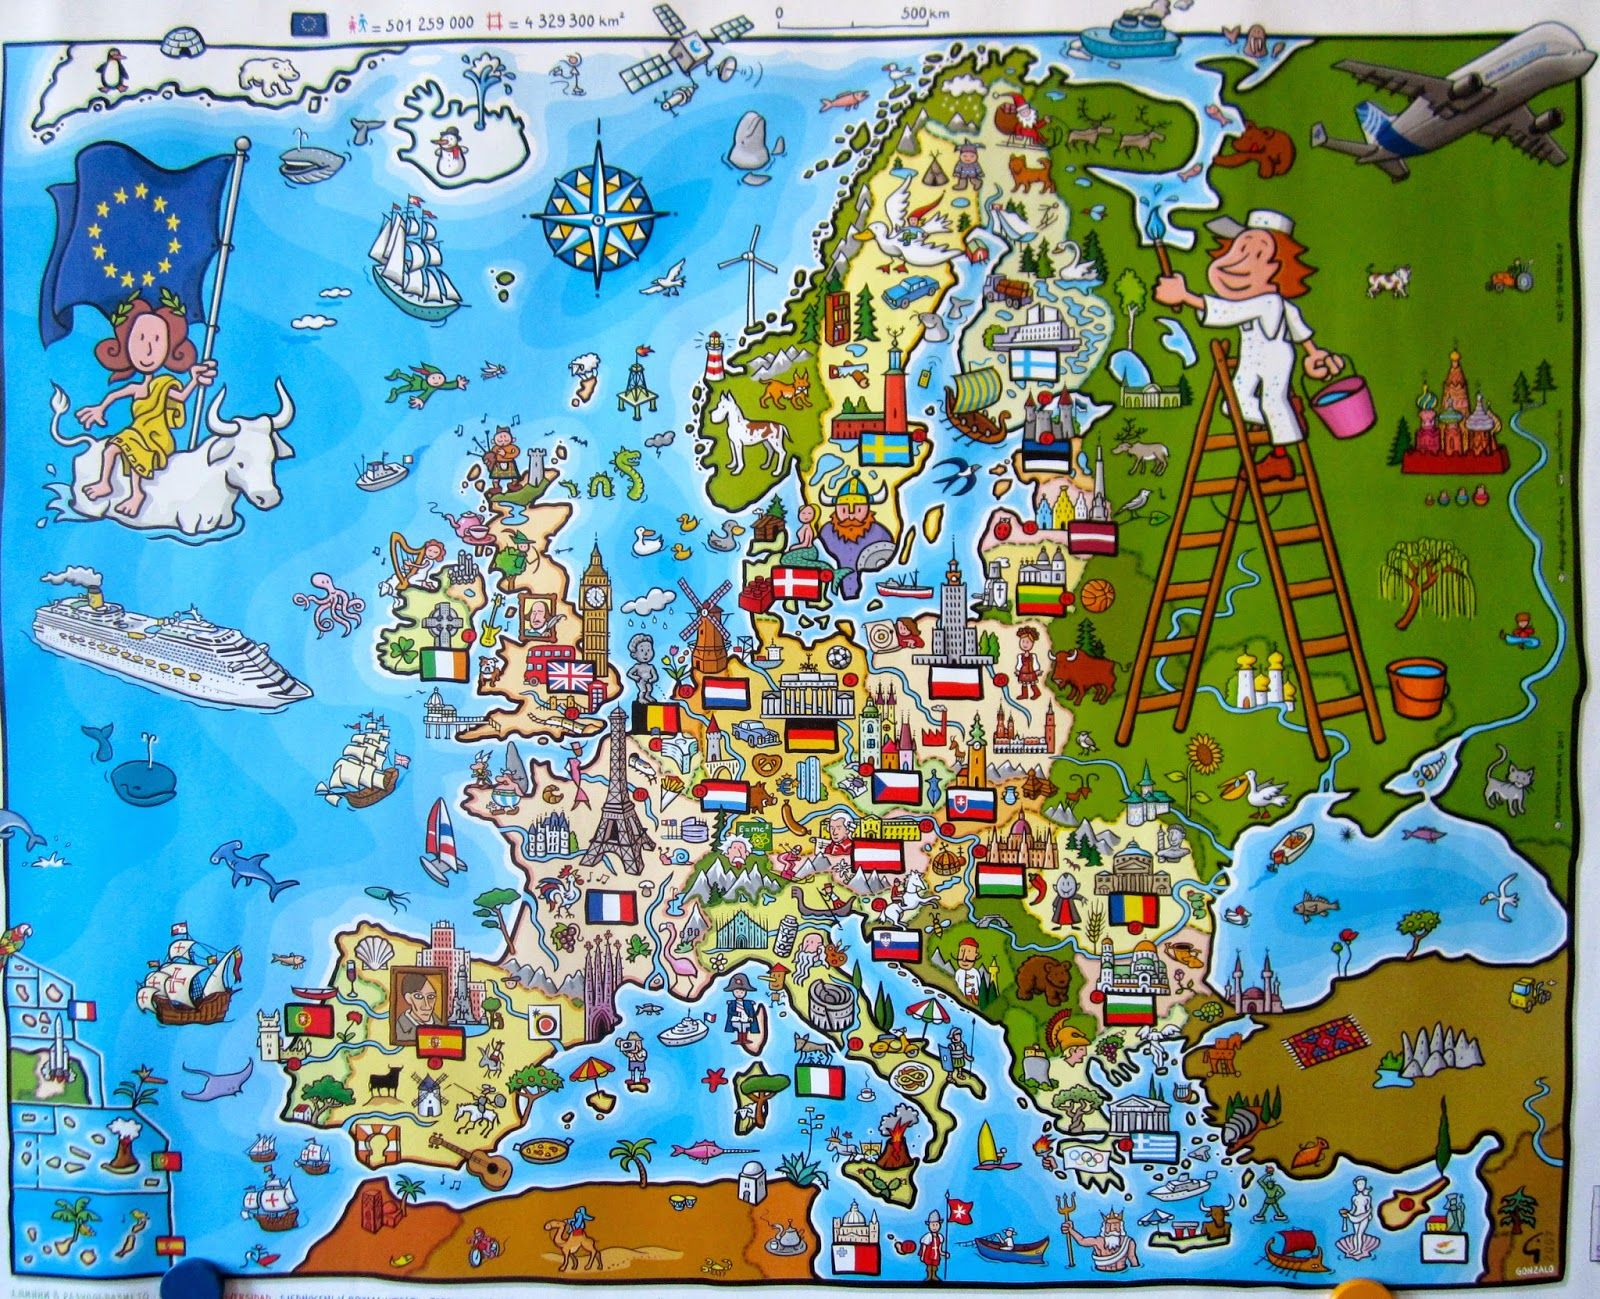 Eurooppa Paiva Tanska 2h Eurooppa Kartta Tanska